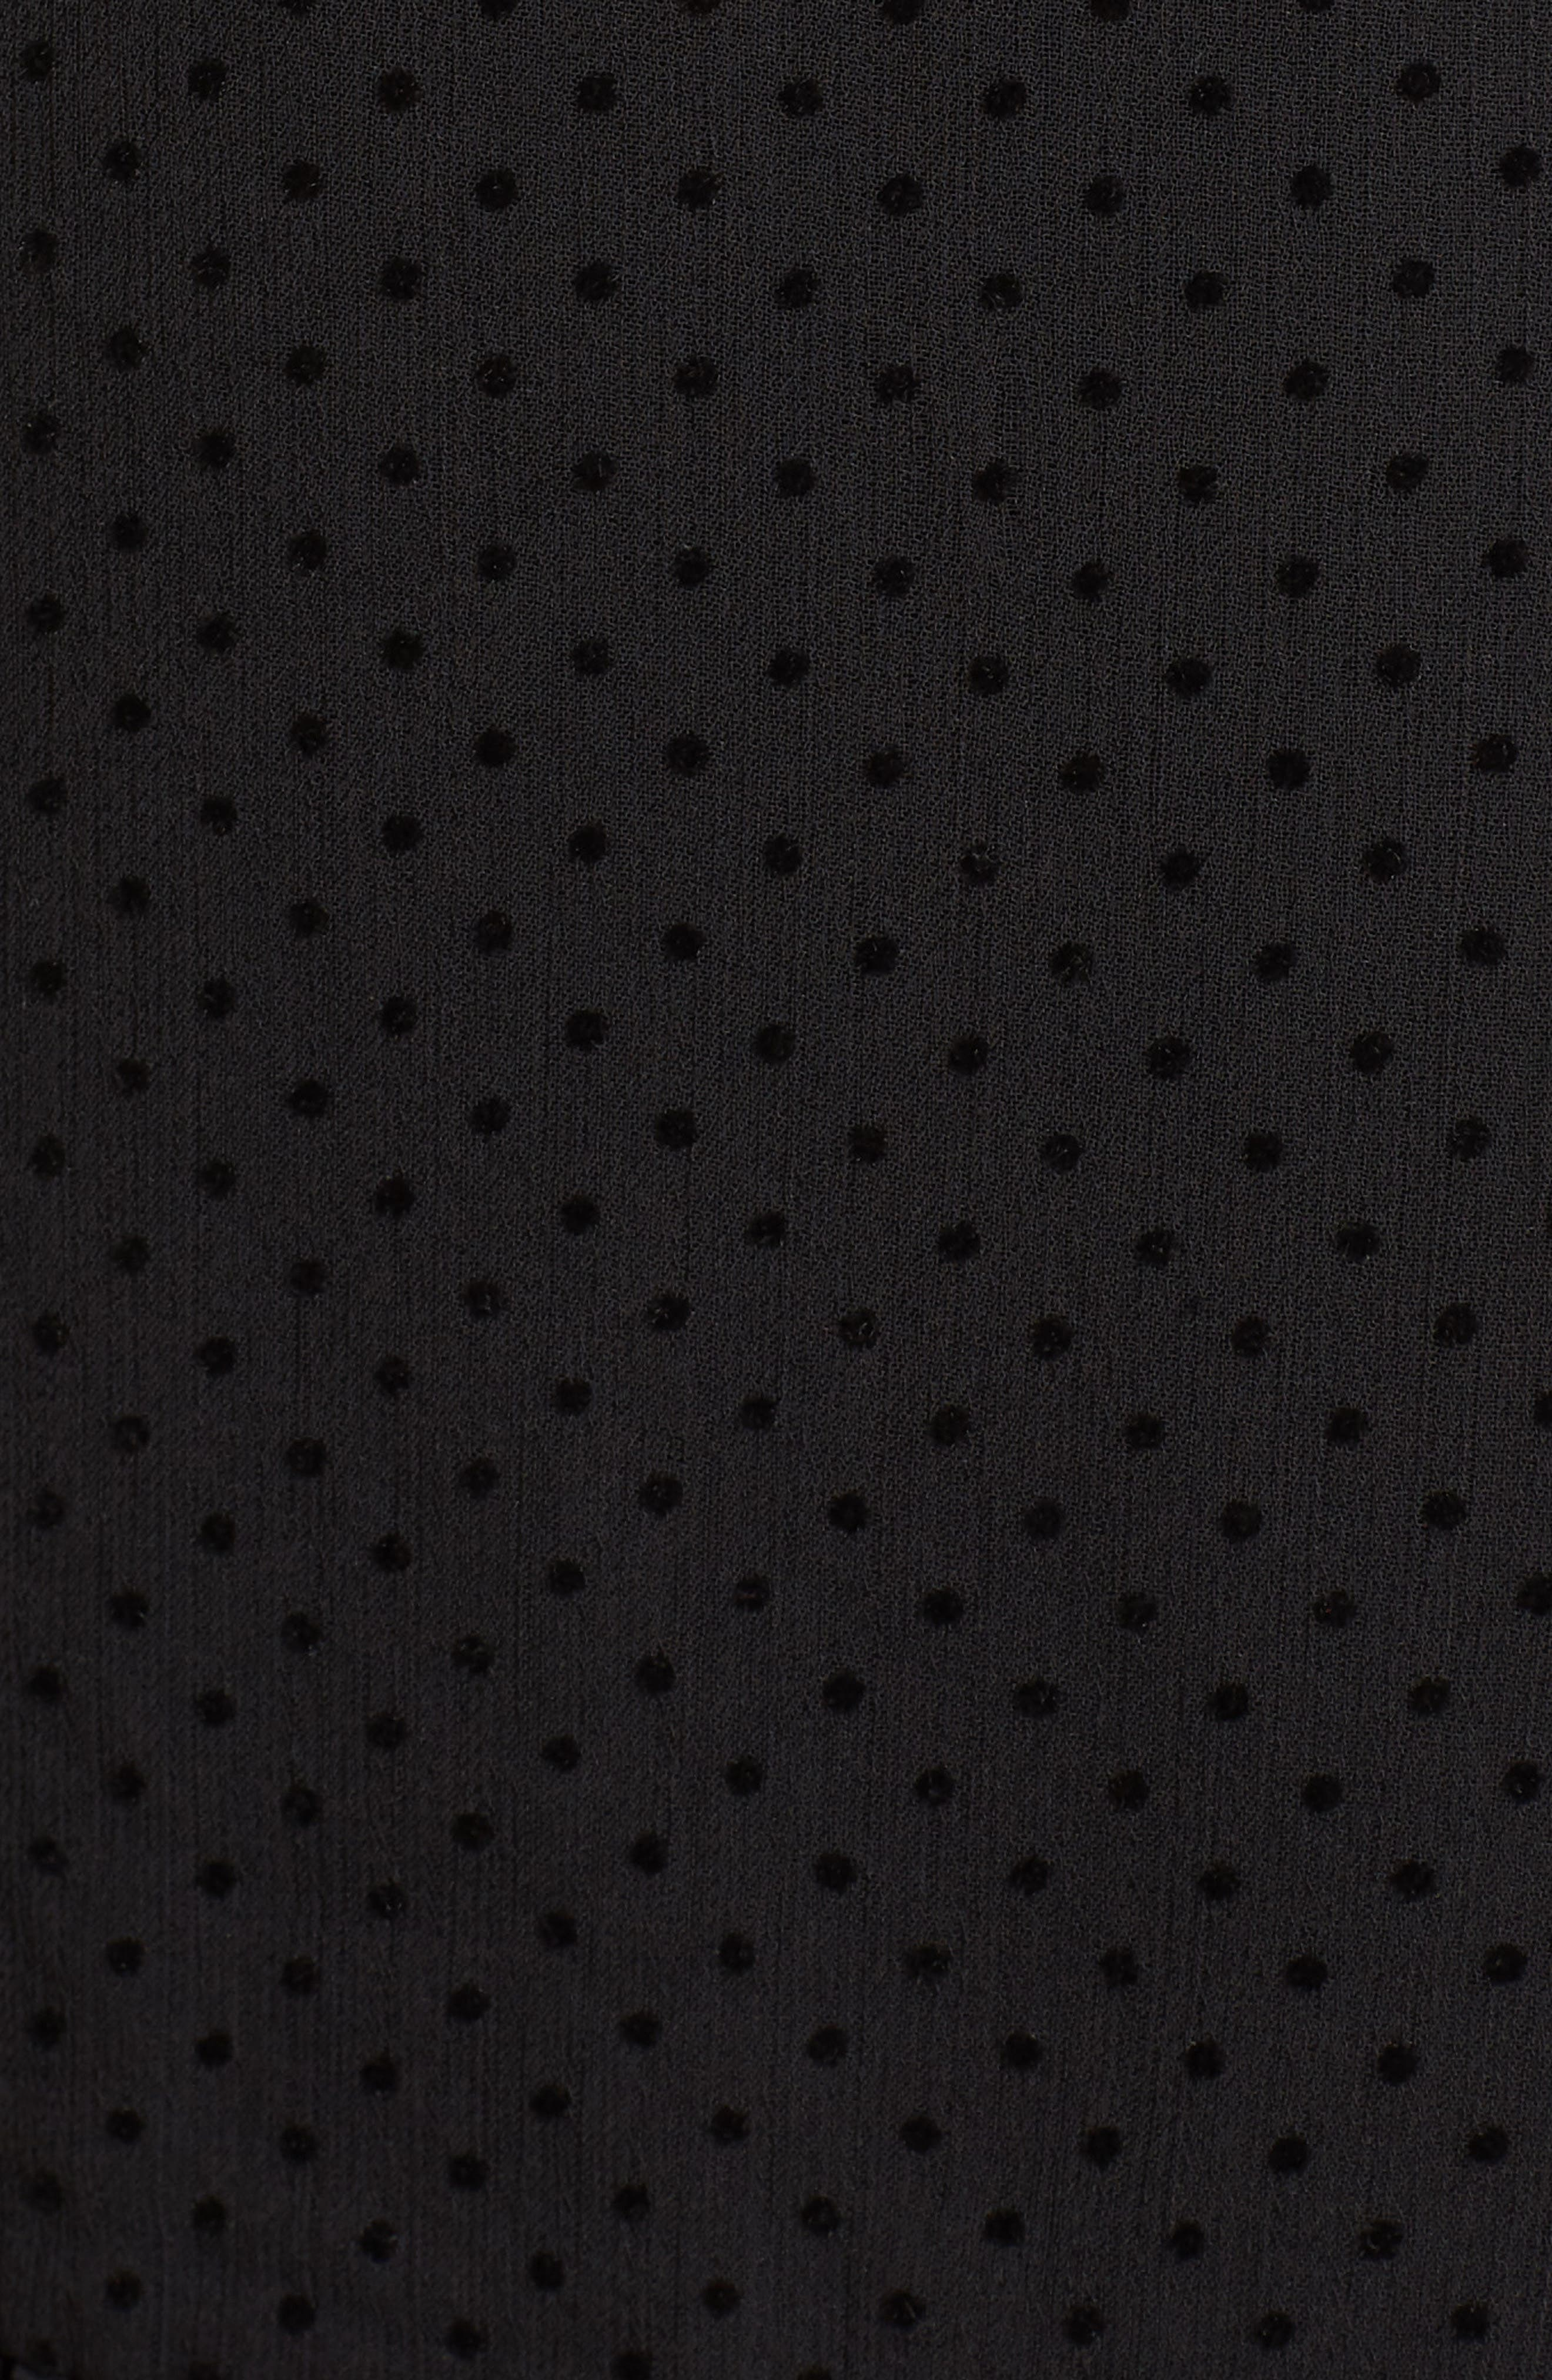 Horizons Bell Sleeve Minidress,                             Alternate thumbnail 5, color,                             001